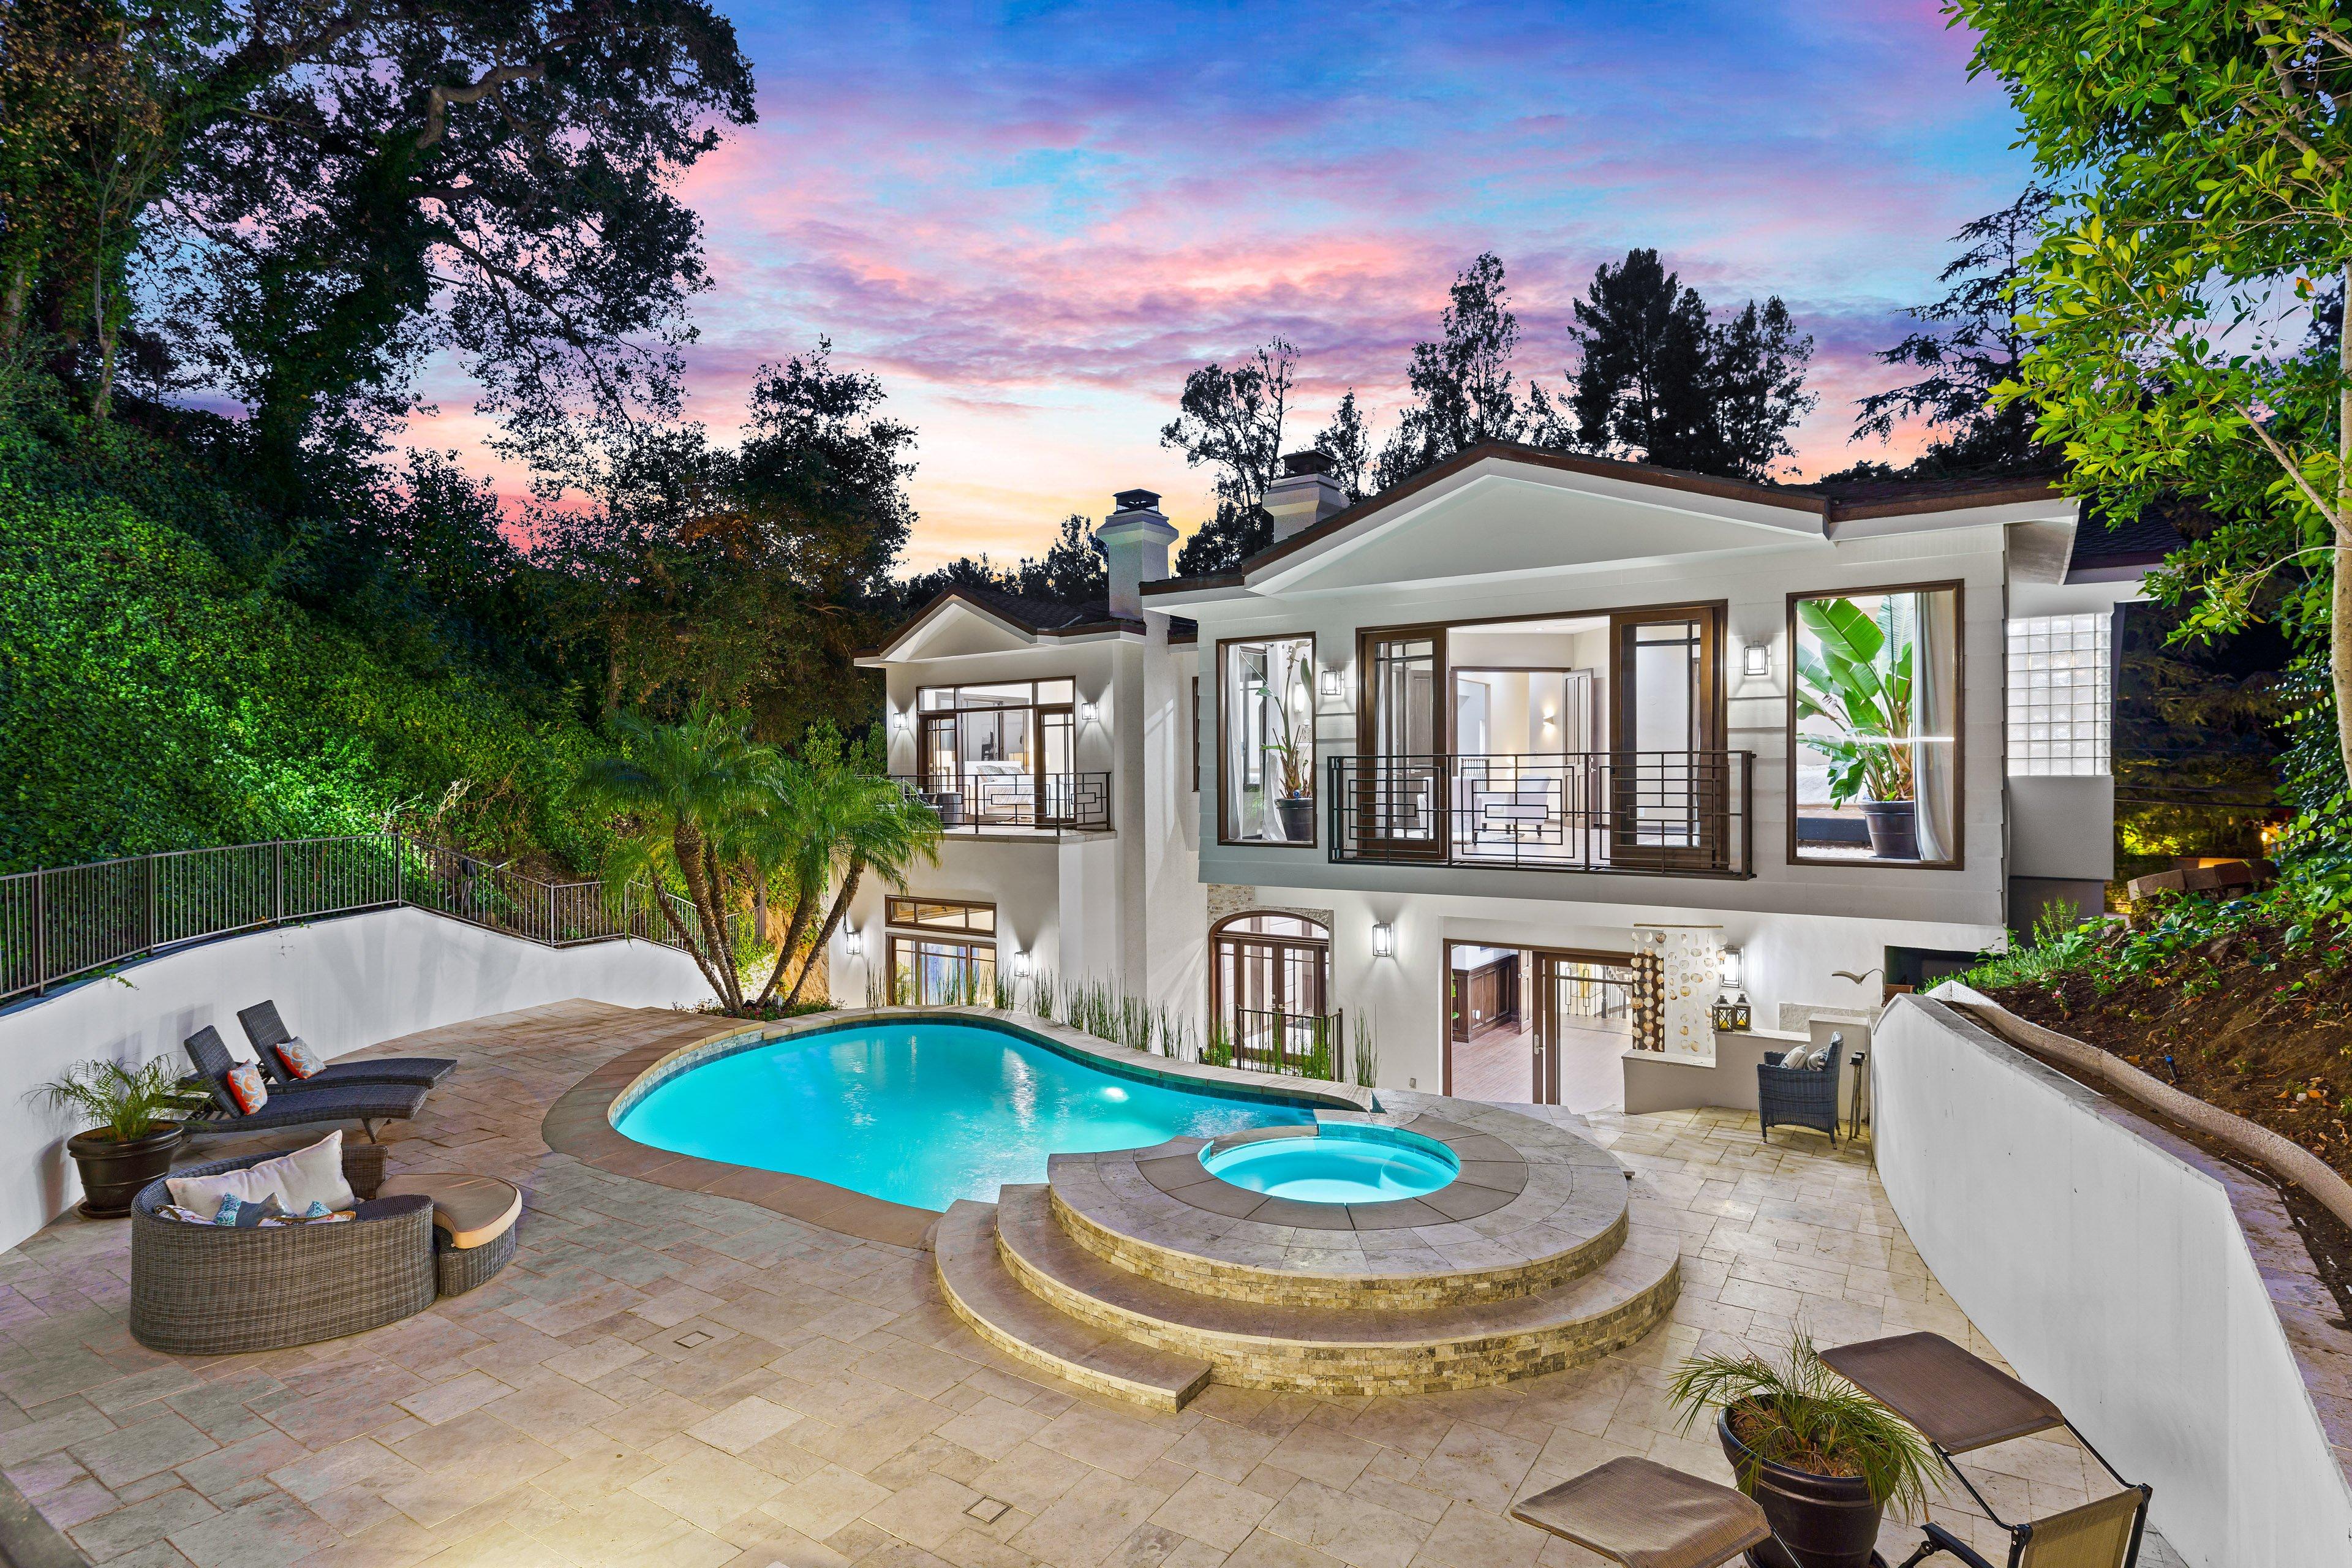 2650 Hutton Dr, Beverly Hills, CA 90210